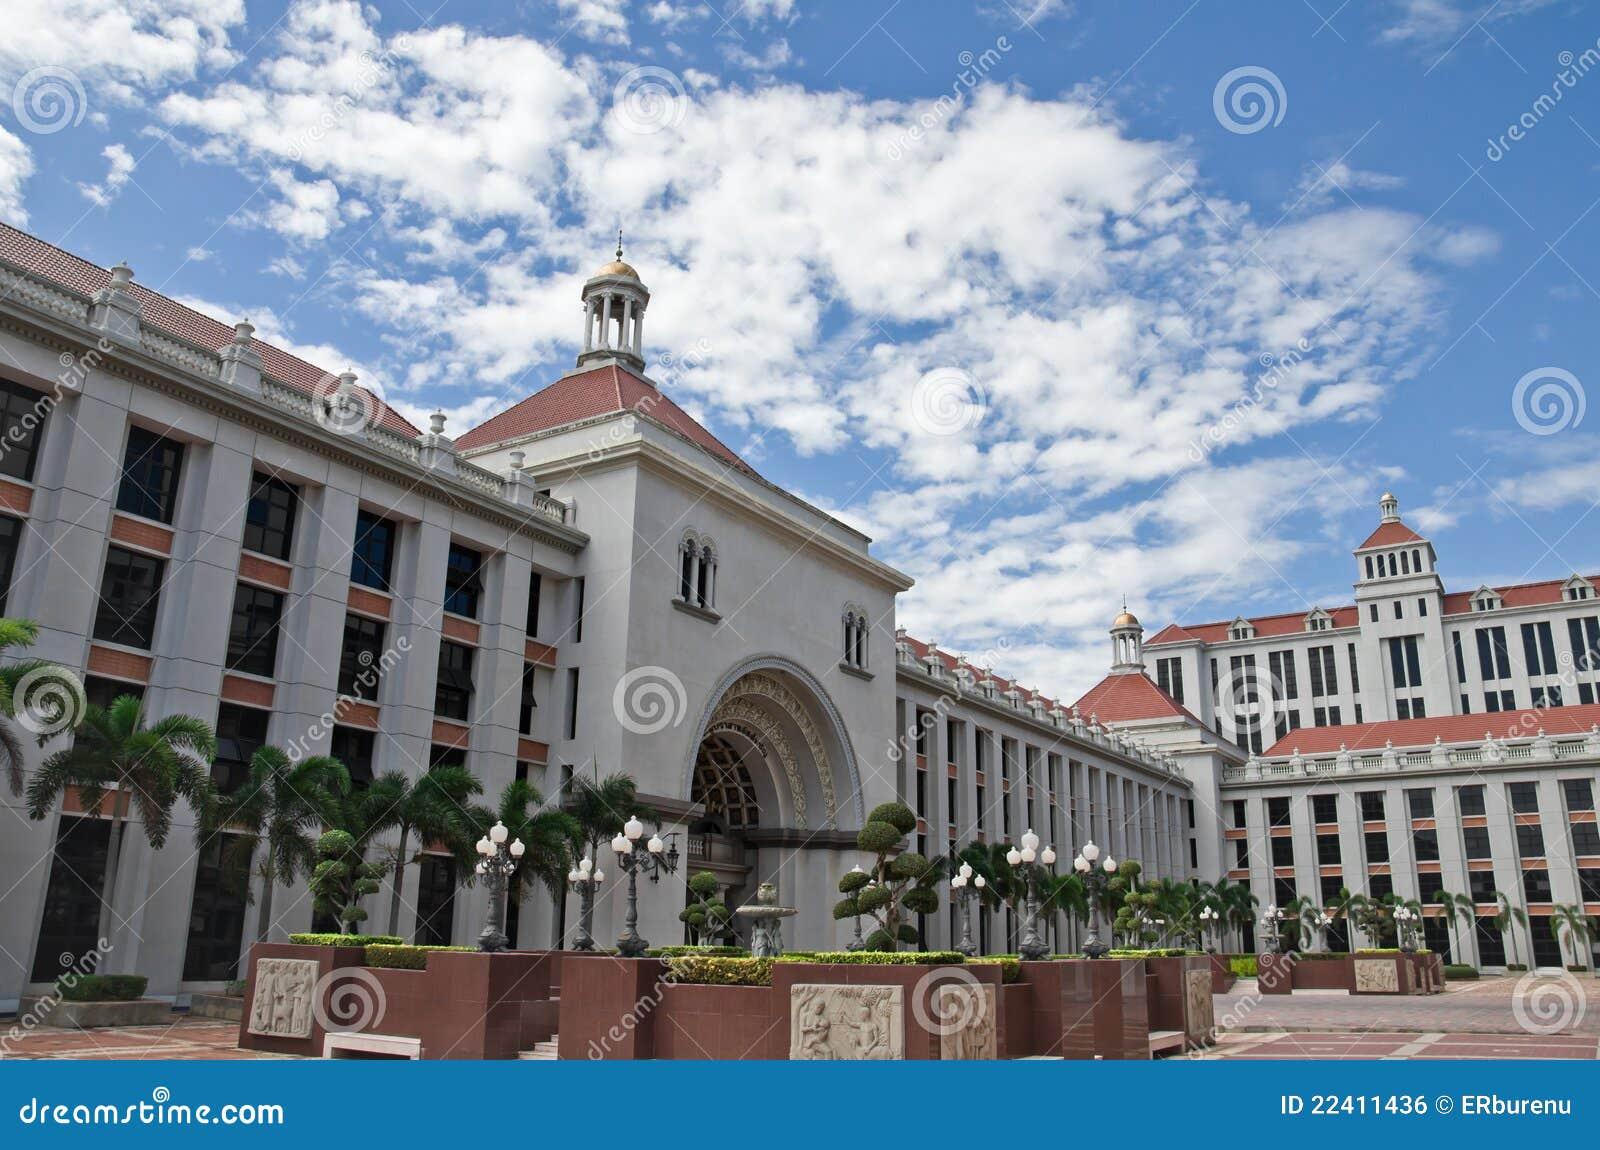 Building of Assumption University